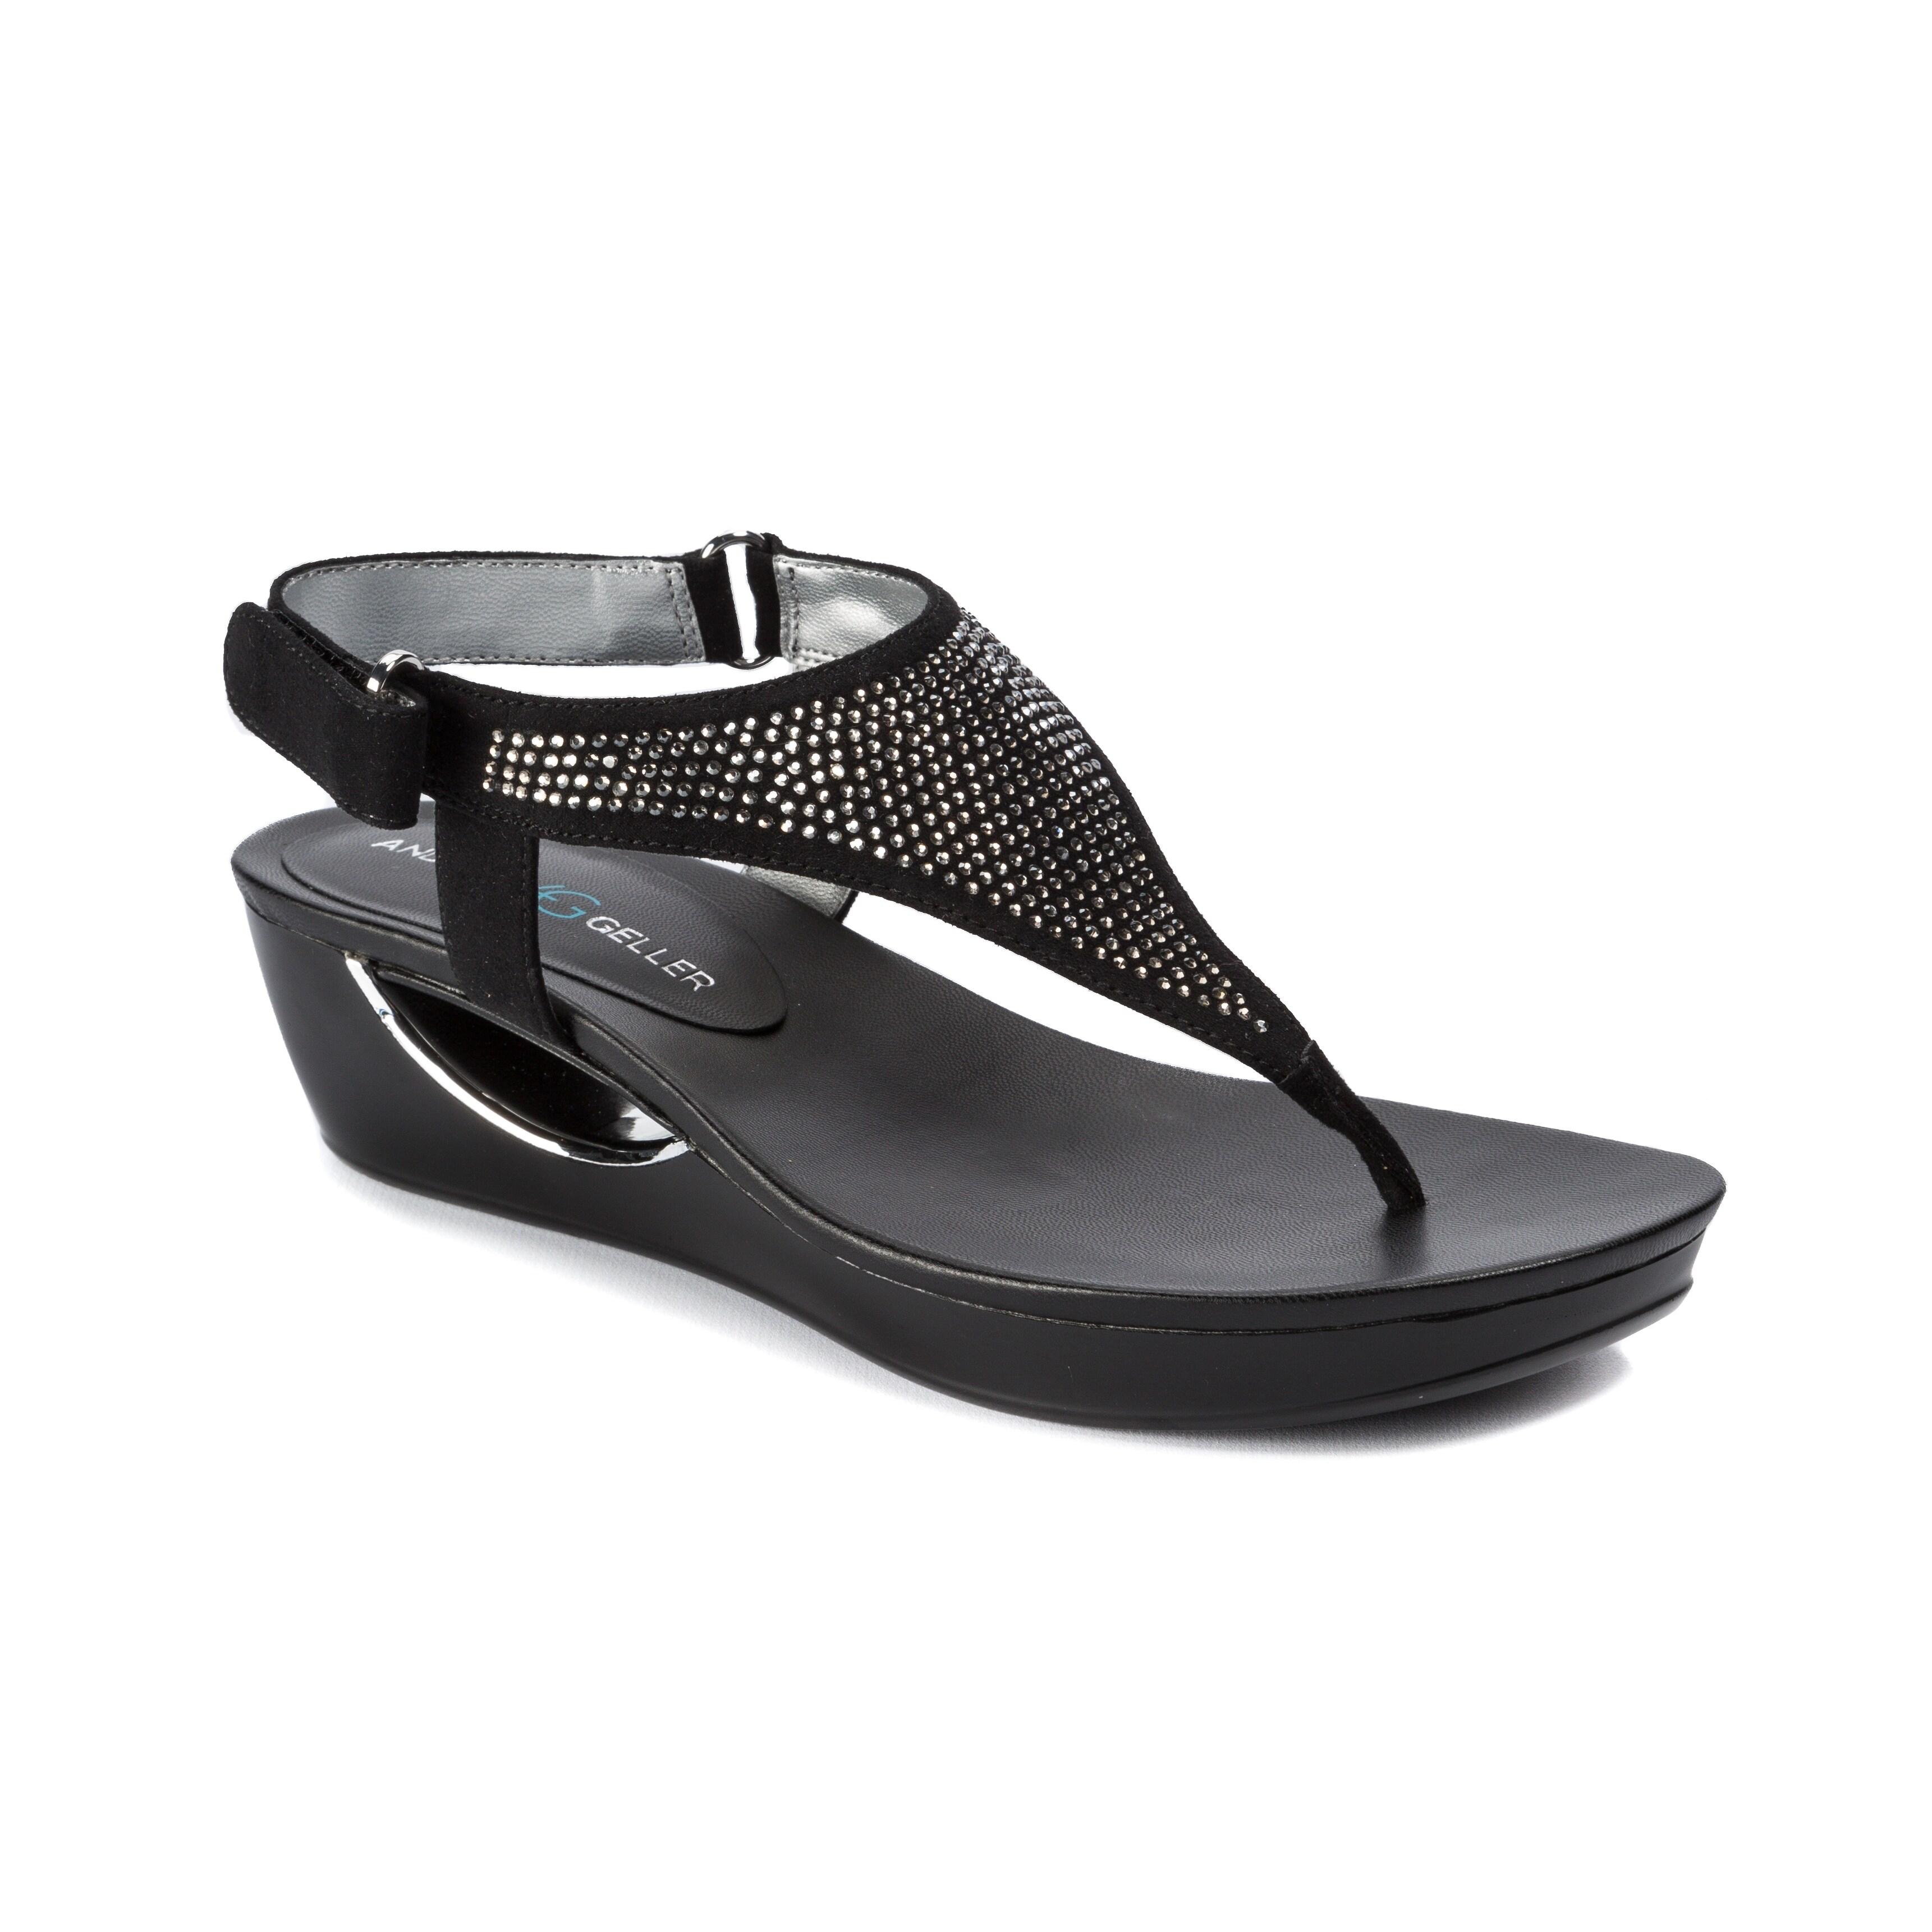 Carlita Wedge Sandals Andrew Geller Womens